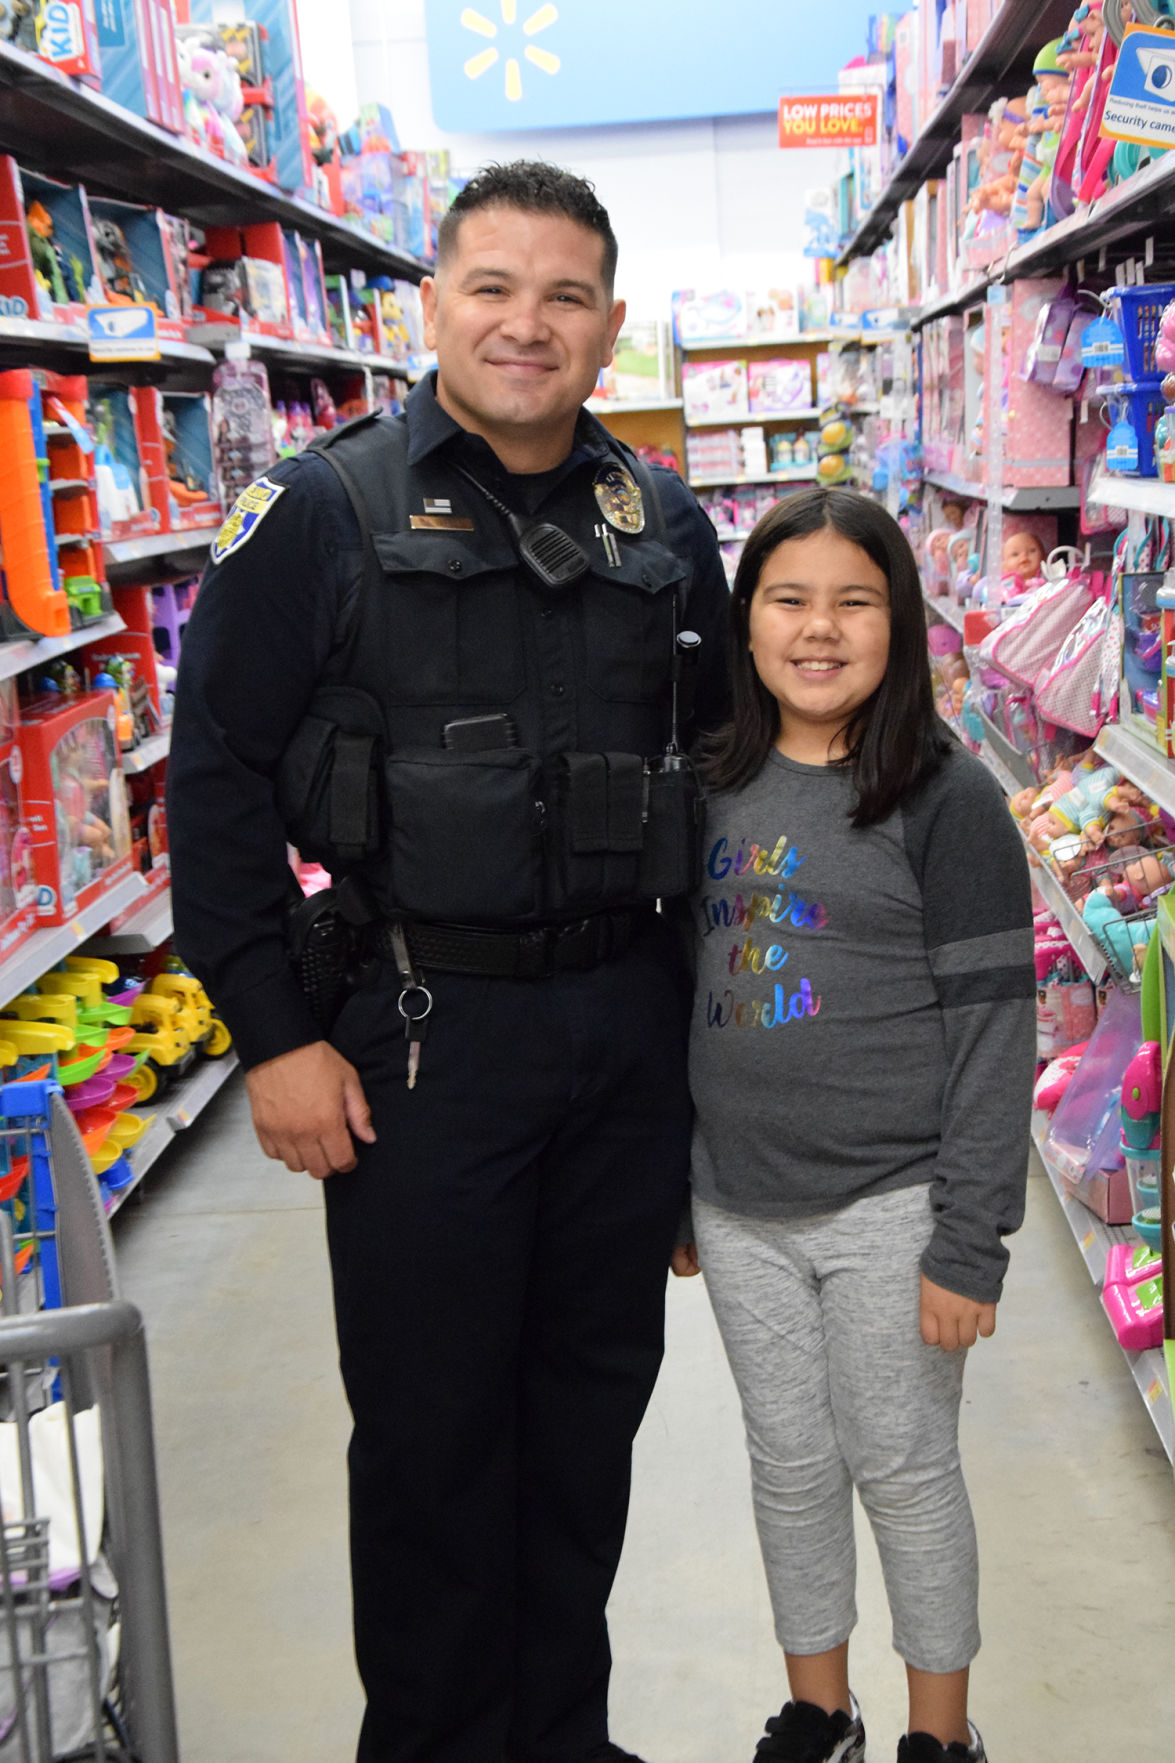 Delano Shop with a Cop event.